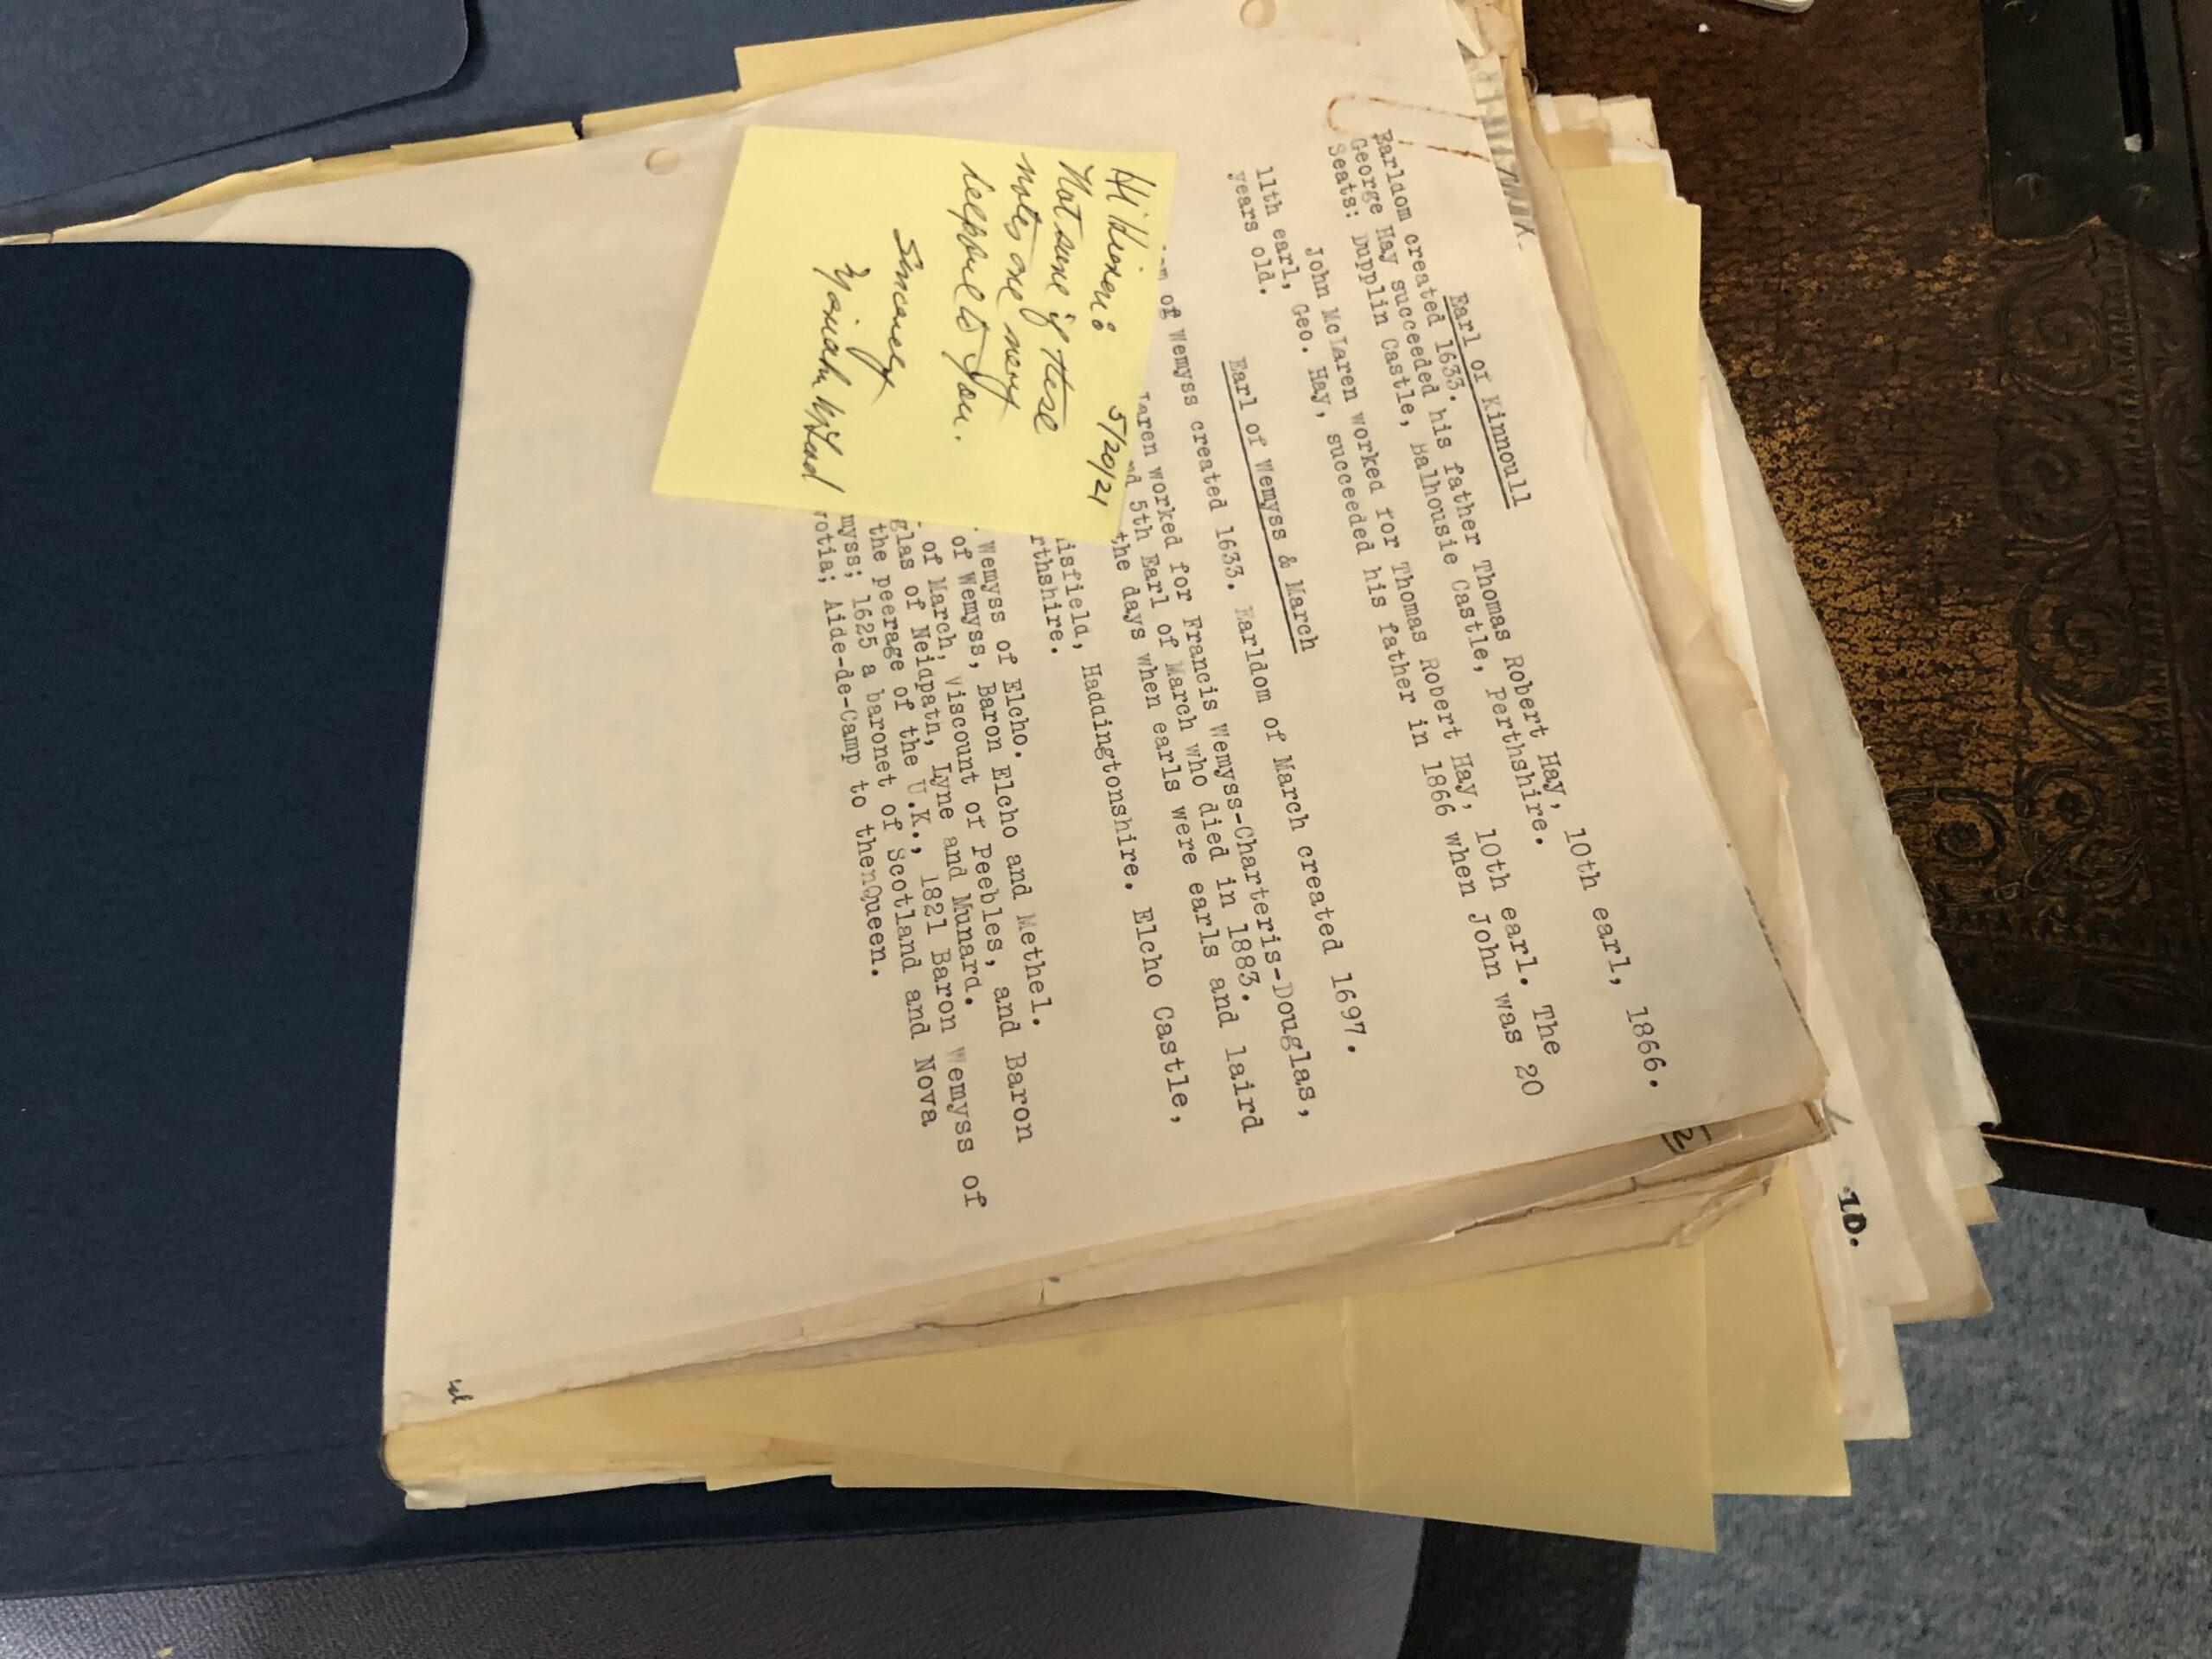 McLeod book notes